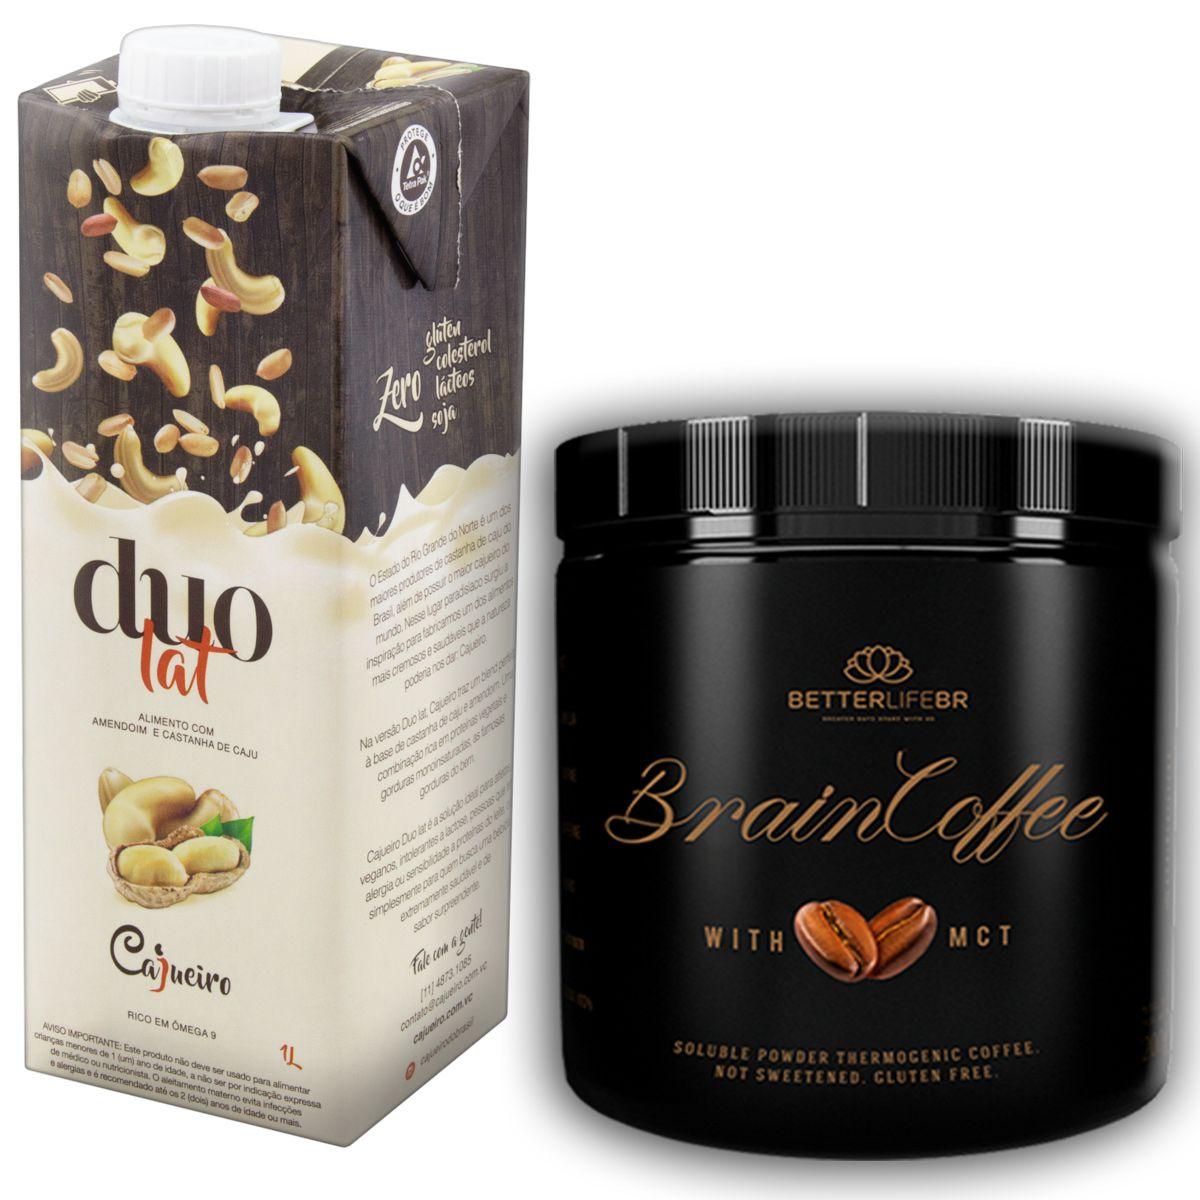 1 Brain Coffee com MCT 200g e 1 Leite Vegetal Duolat 1lt